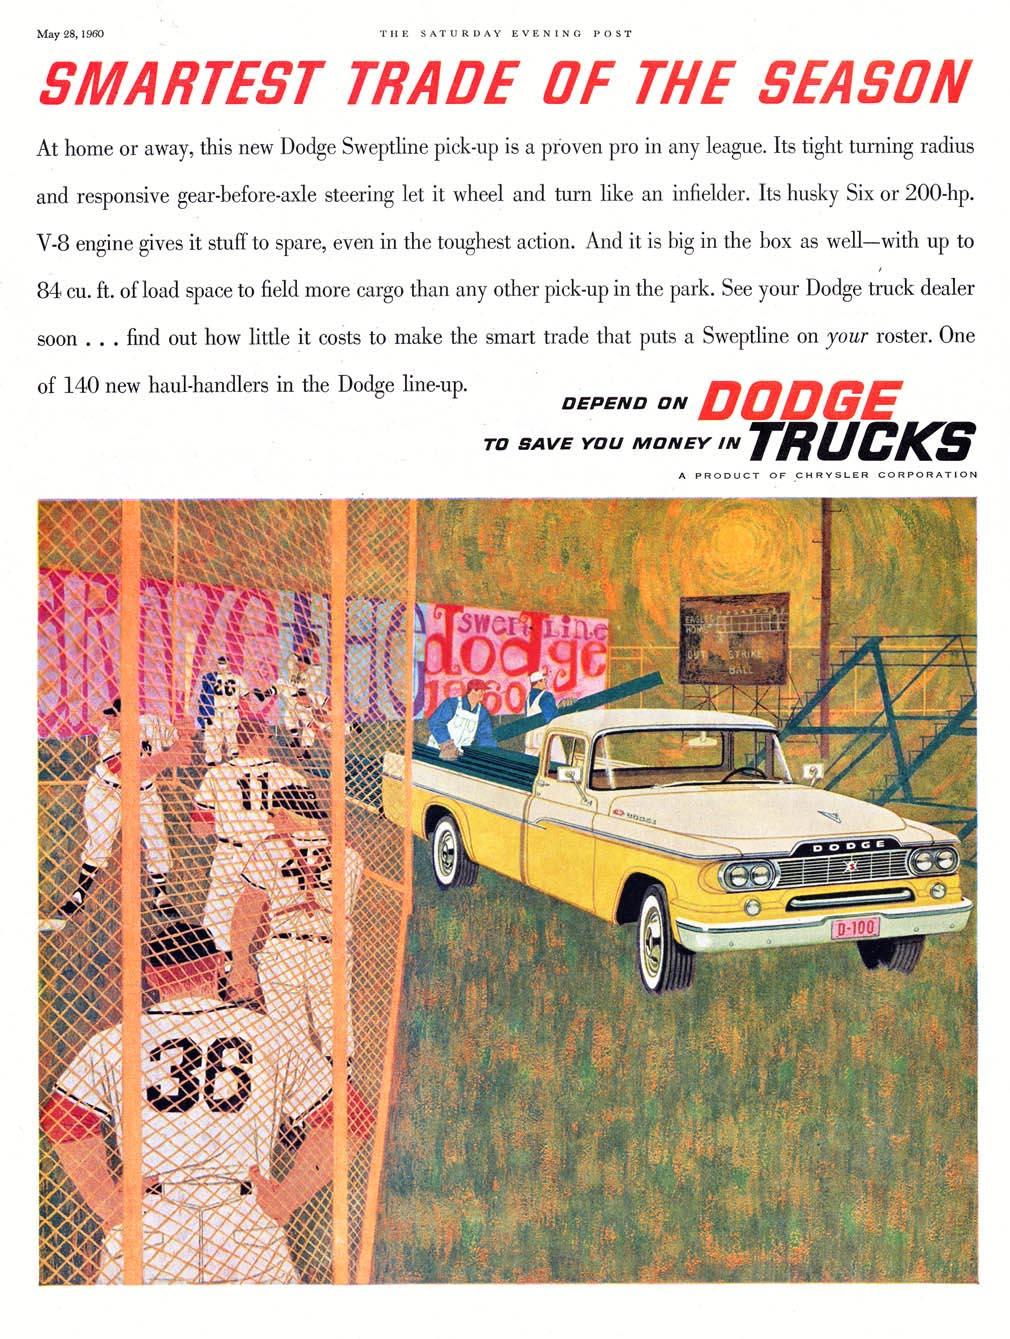 Dodgetrucks02